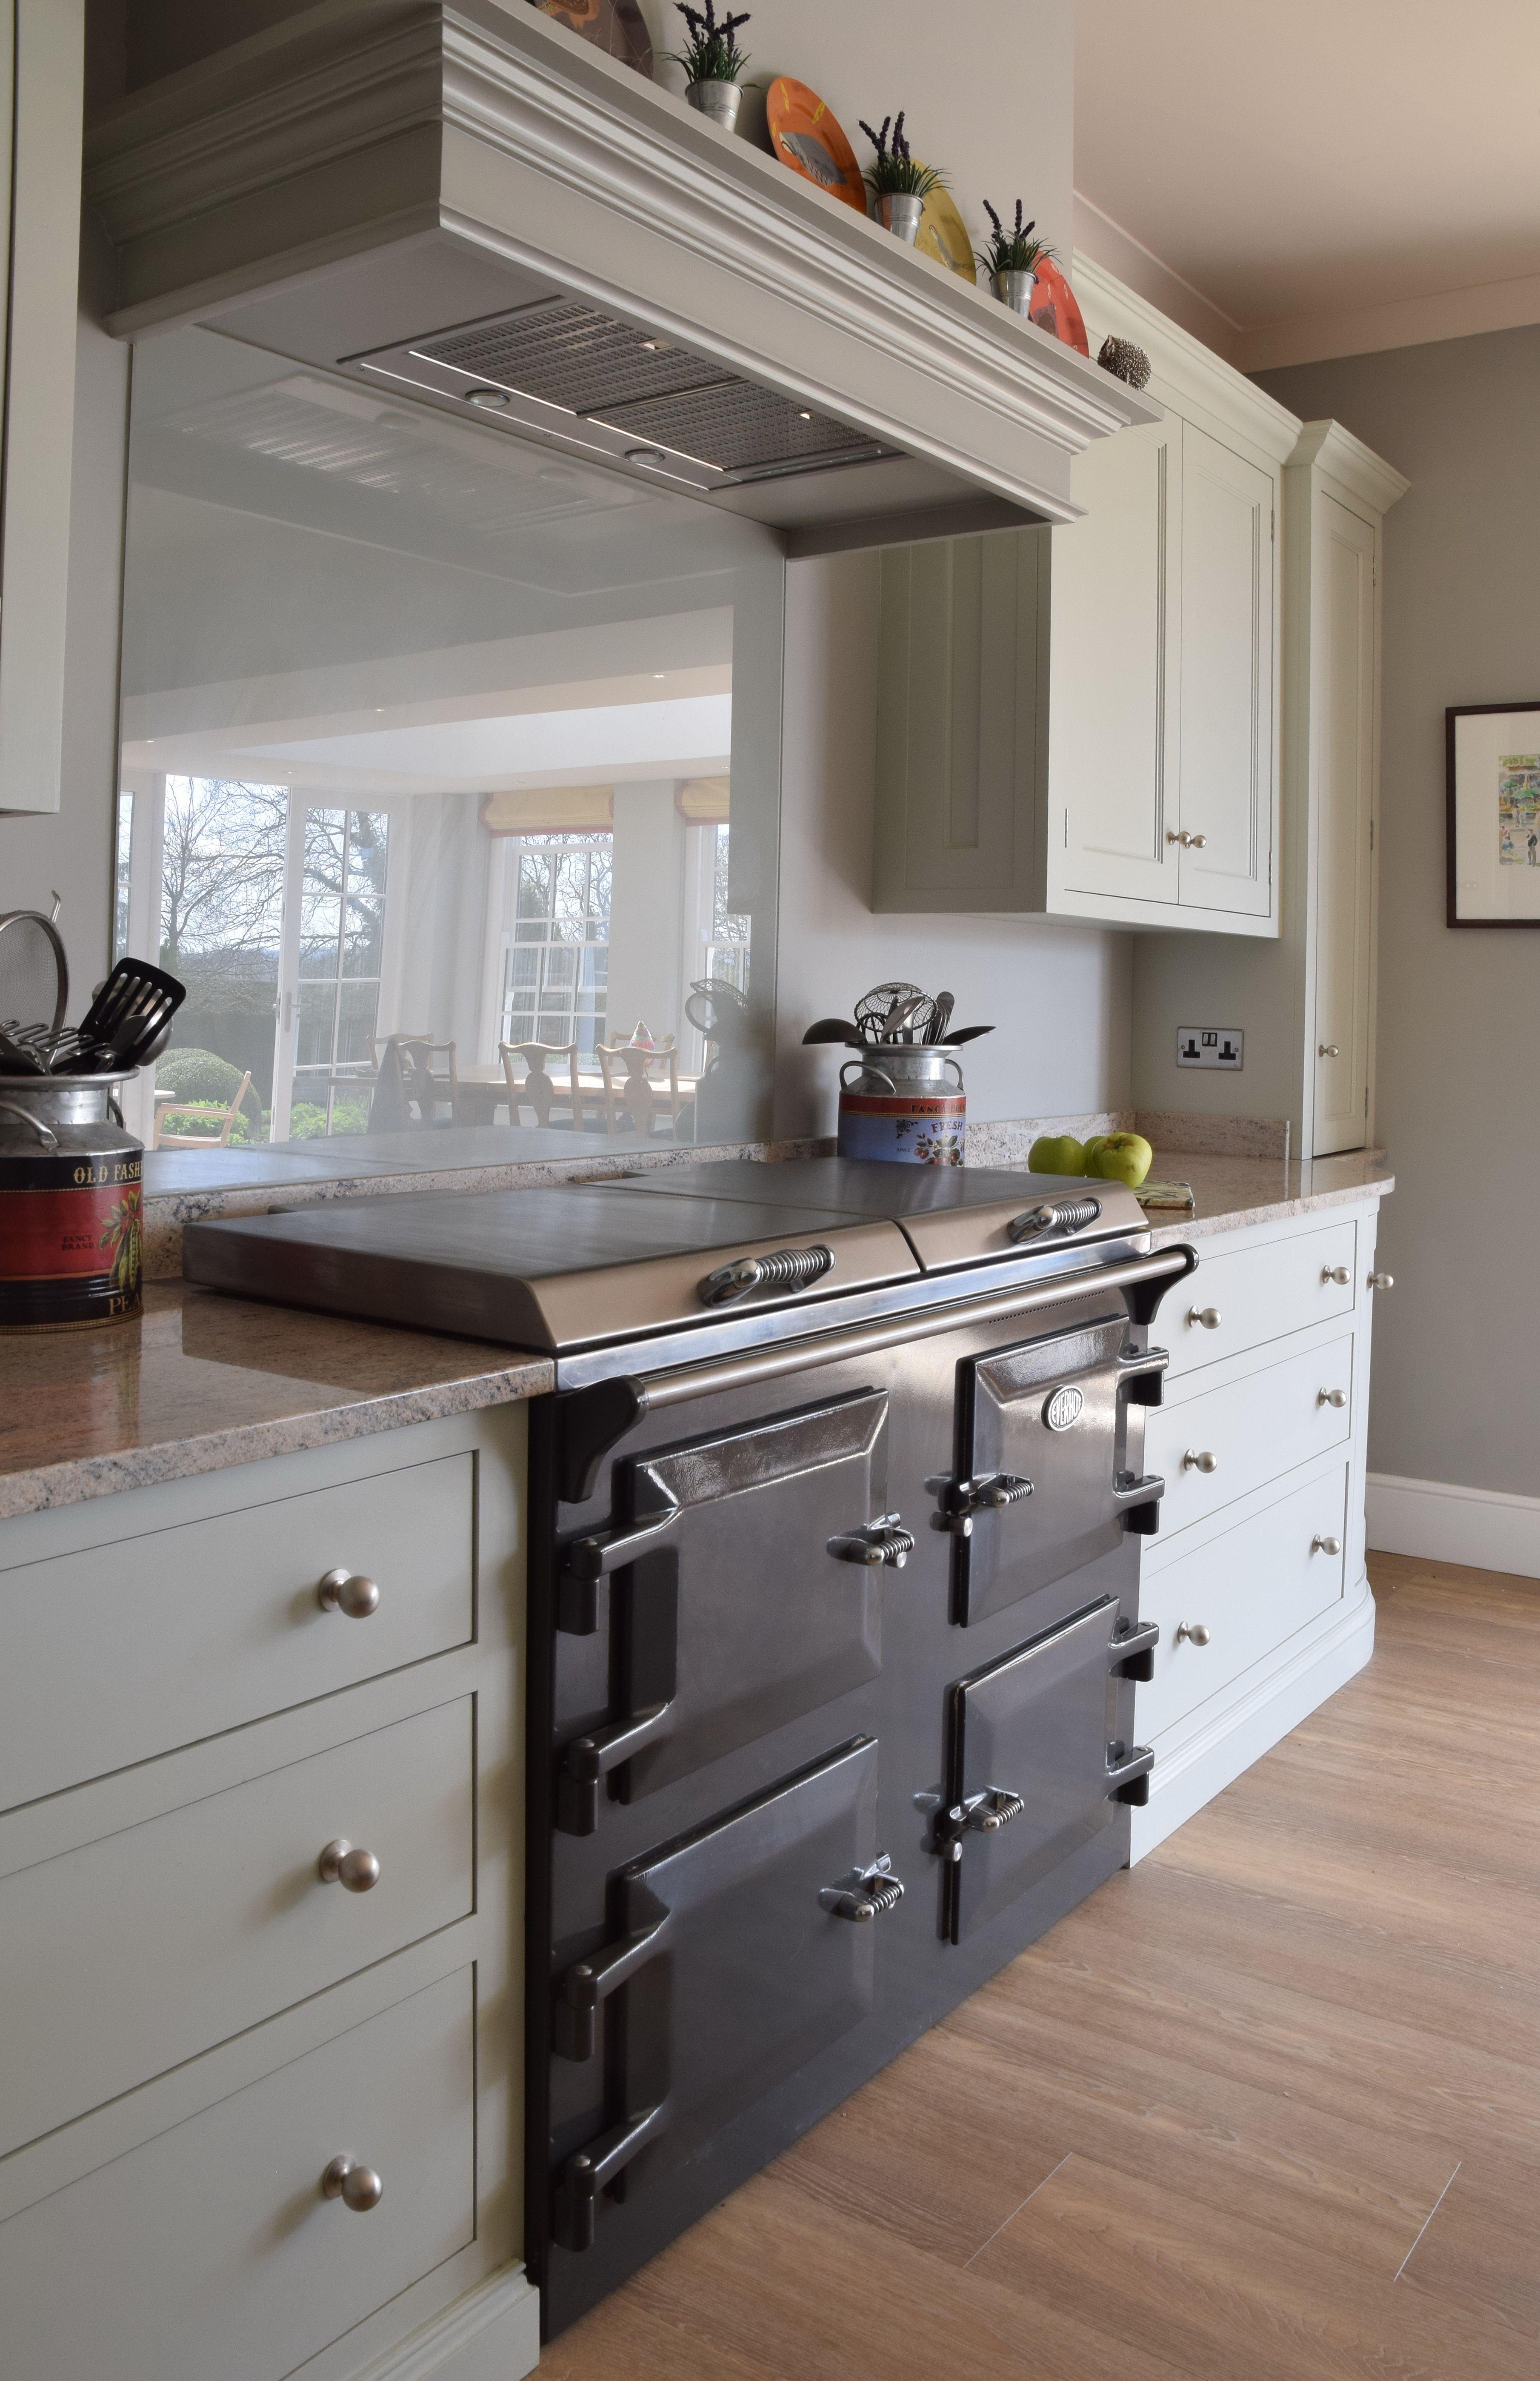 Best Guild Anderson Kitchen Featuring Everhot 120I In Graphite 640 x 480